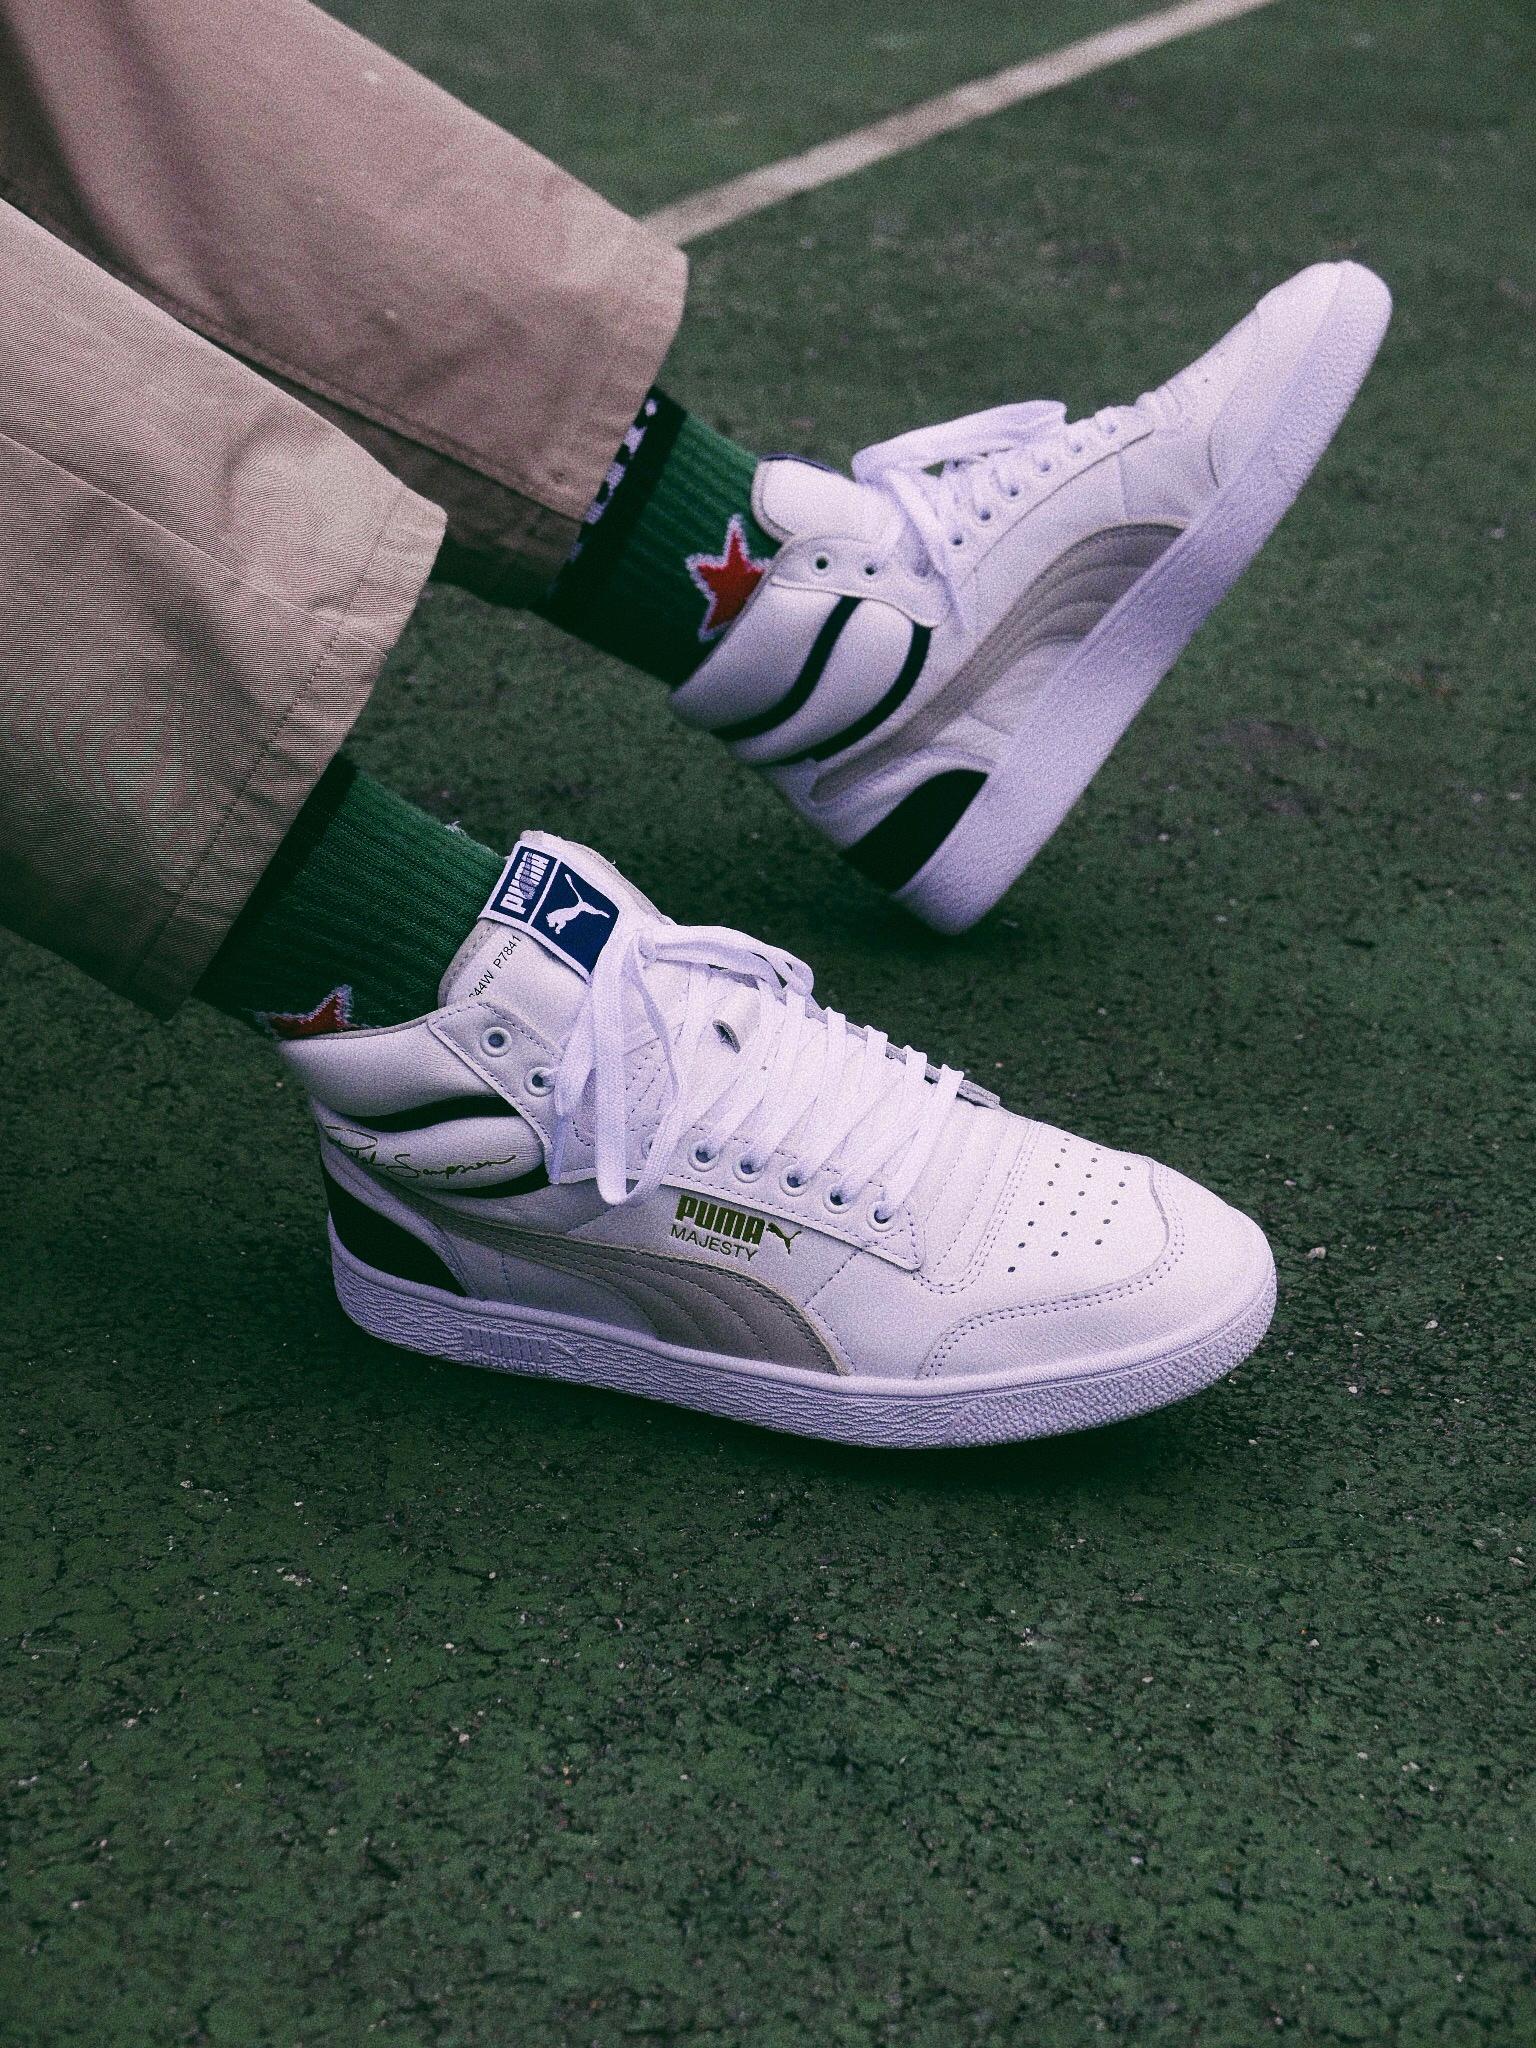 Puma Ralph Sampson | 1999年創業のスニ